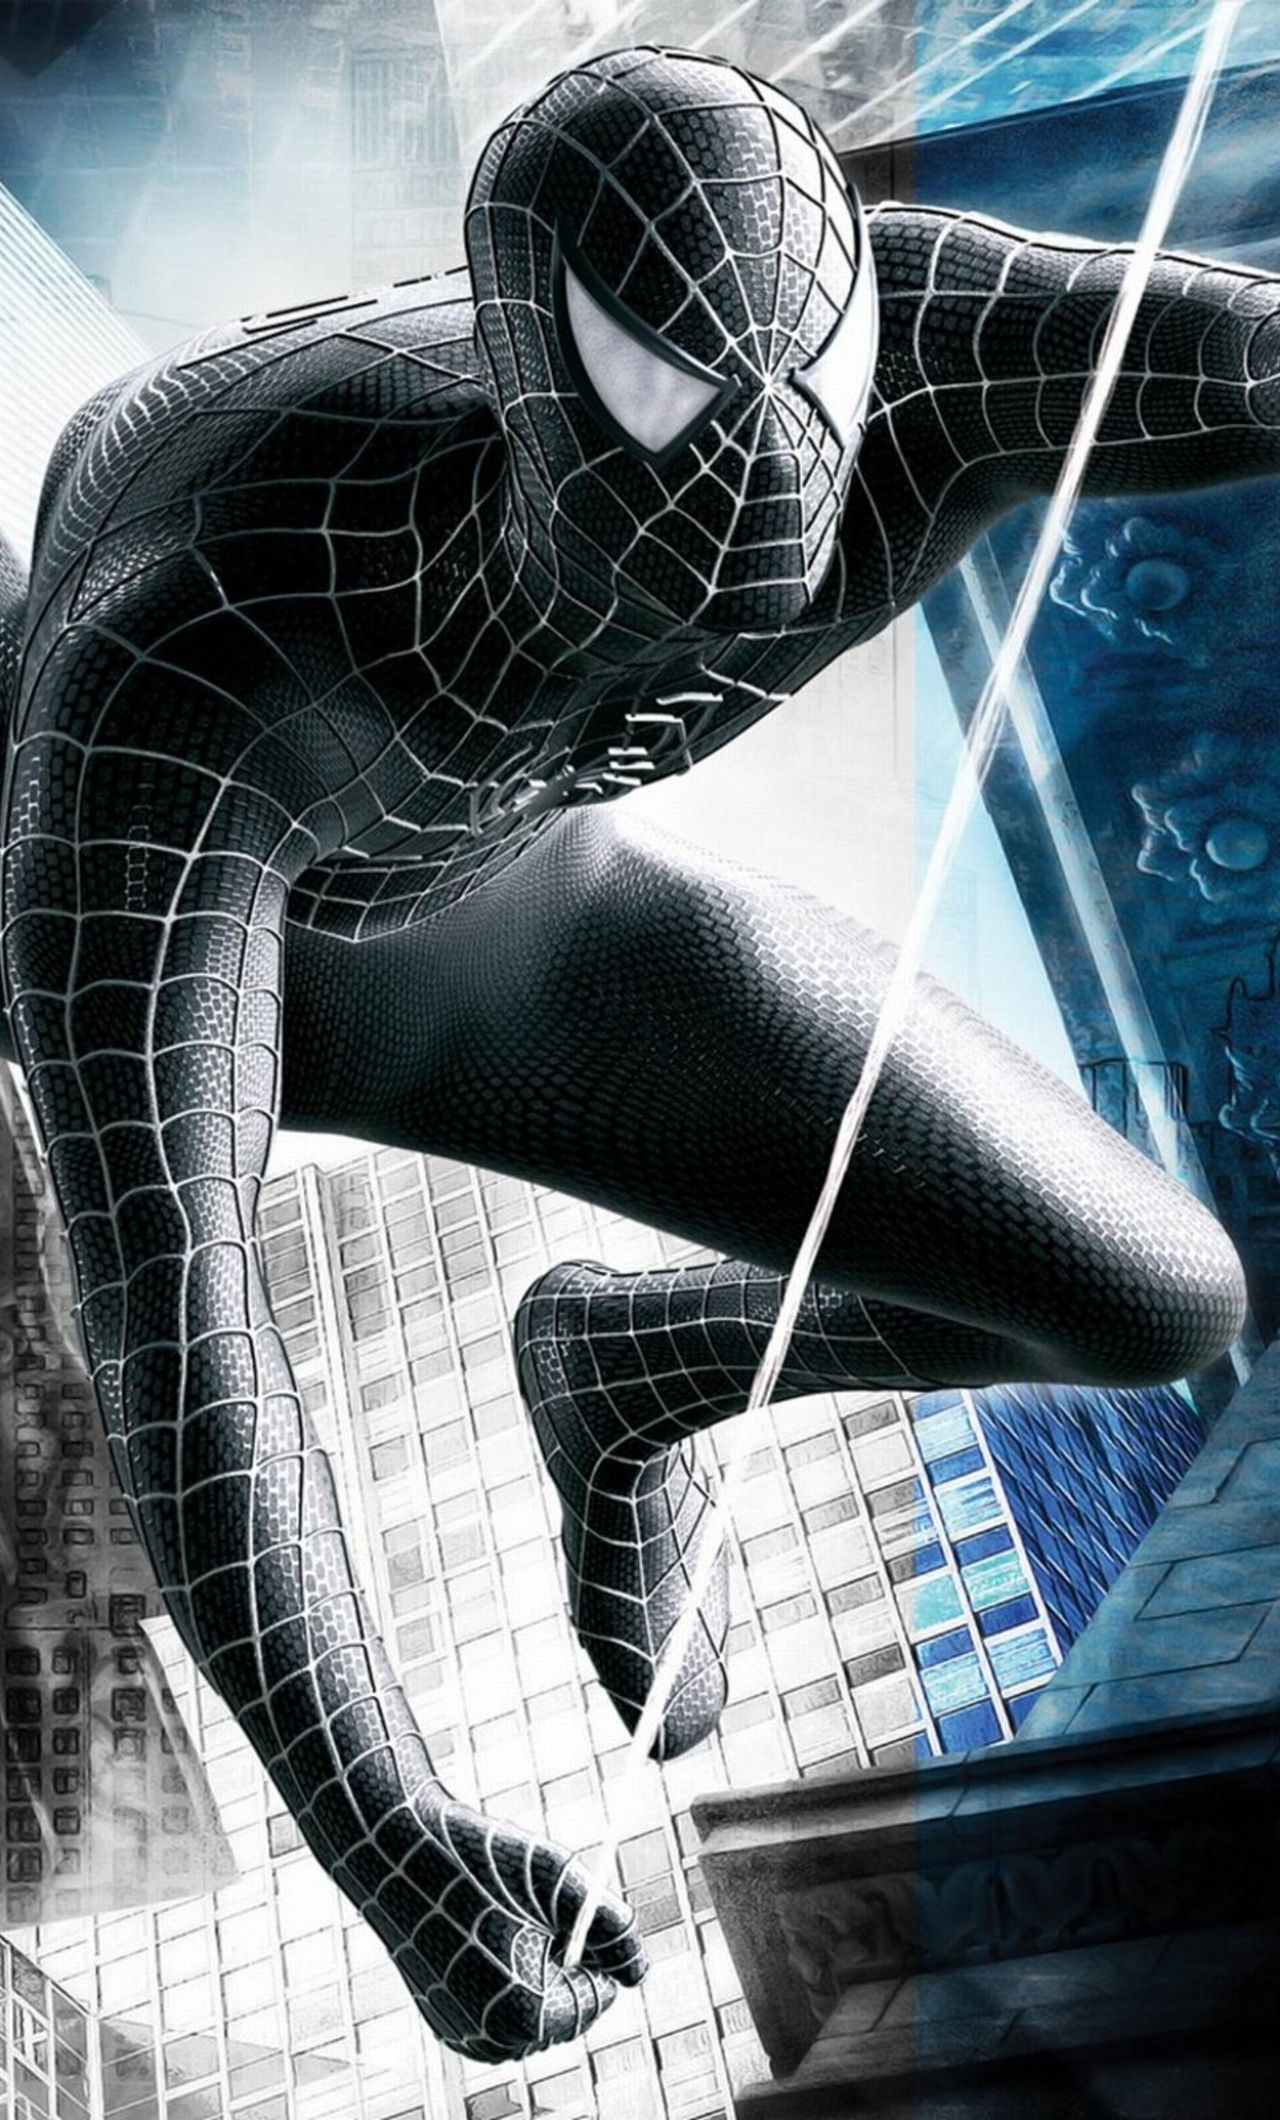 1280x2120 Black Spiderman Superhero Iphone 6 Hd 4k Wallpapers